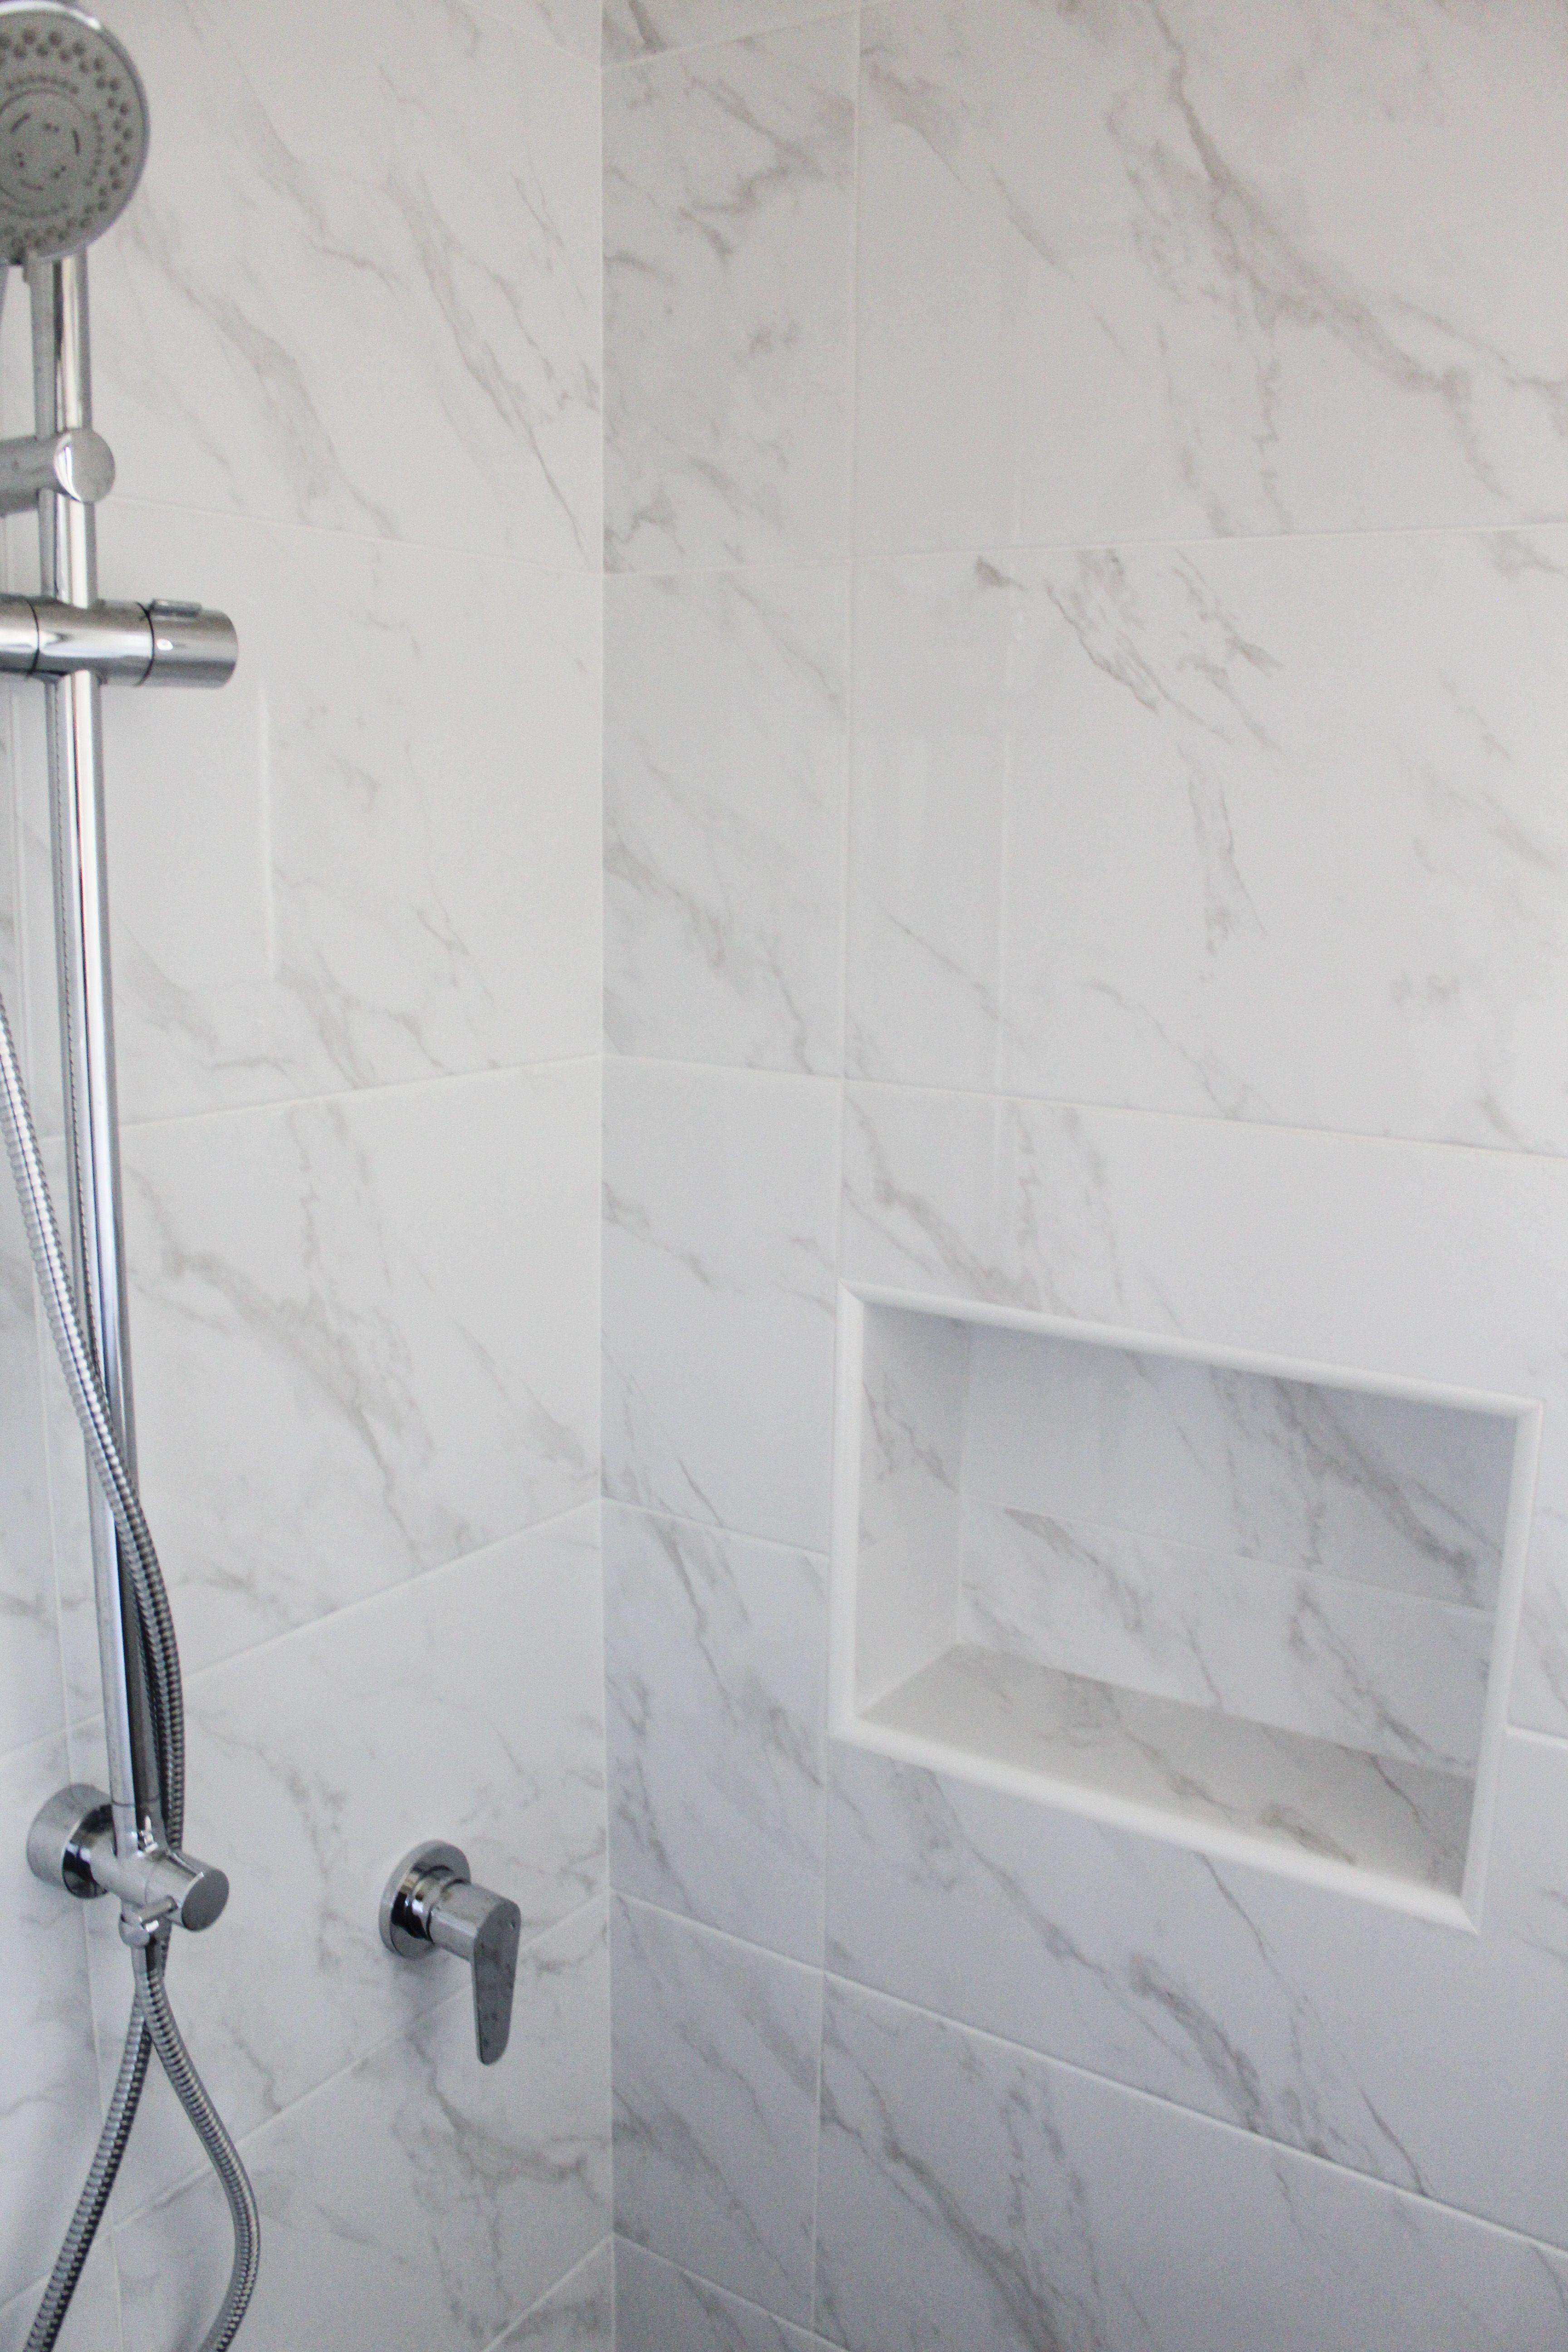 Marble Tiles Marble Bathroom Wall Tiles Marble Bathroom